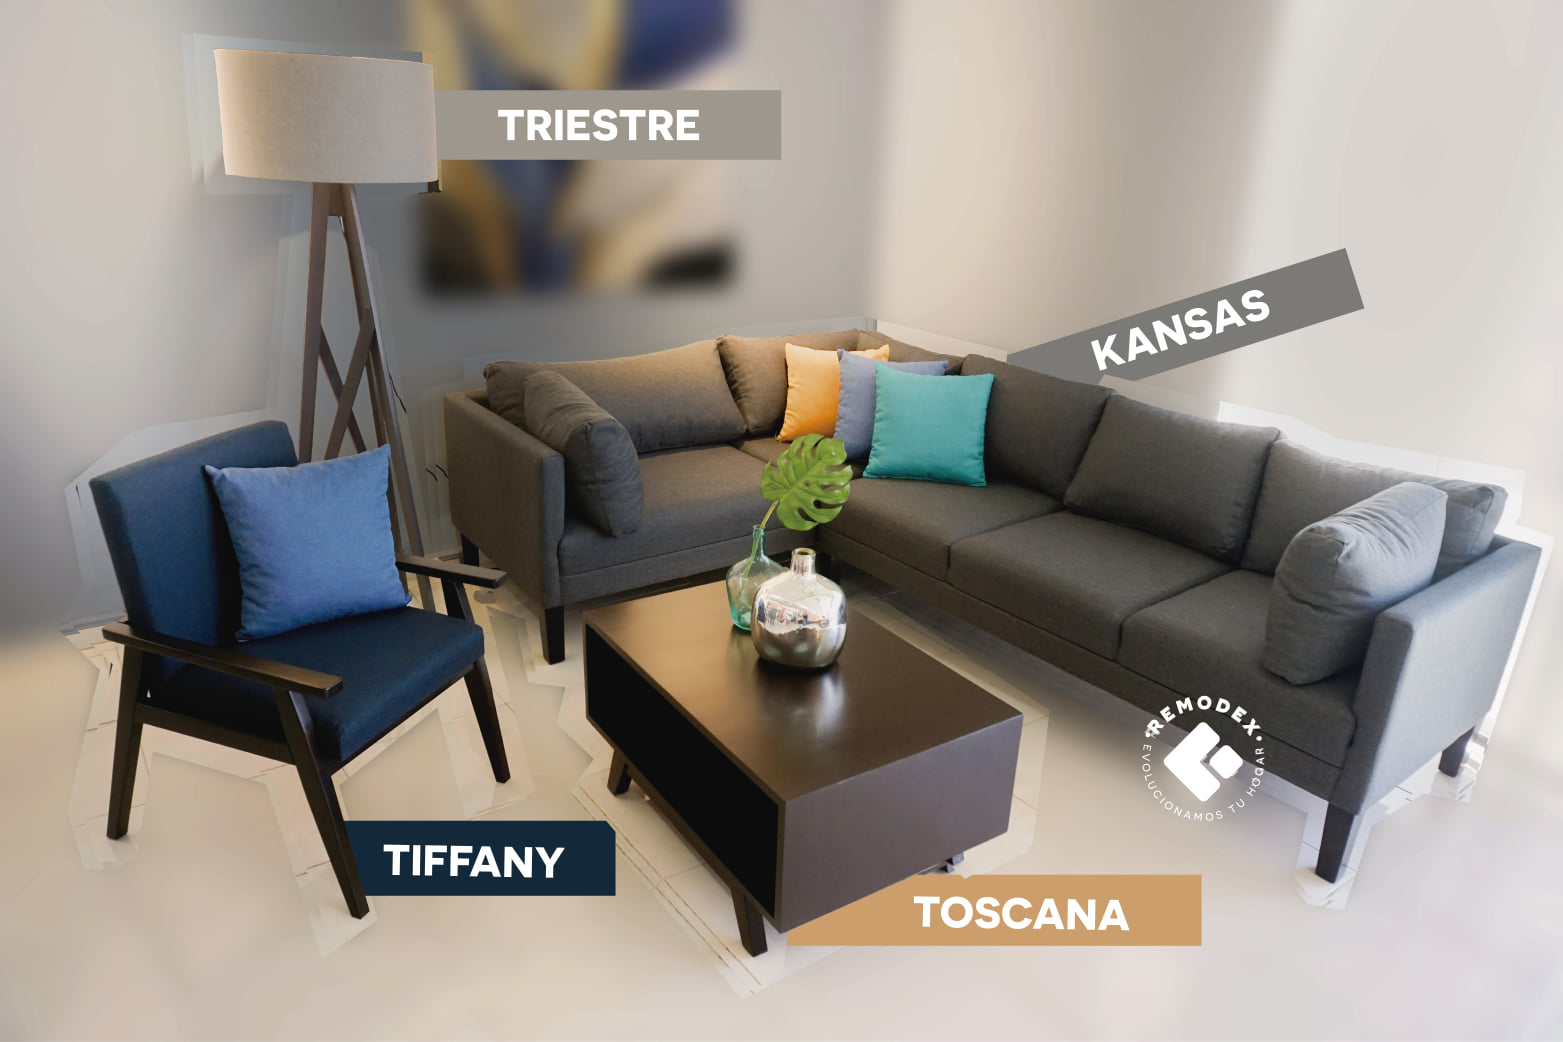 PAQUETE KANSAS/TIFFANY/TOSCANA/TRIESTE